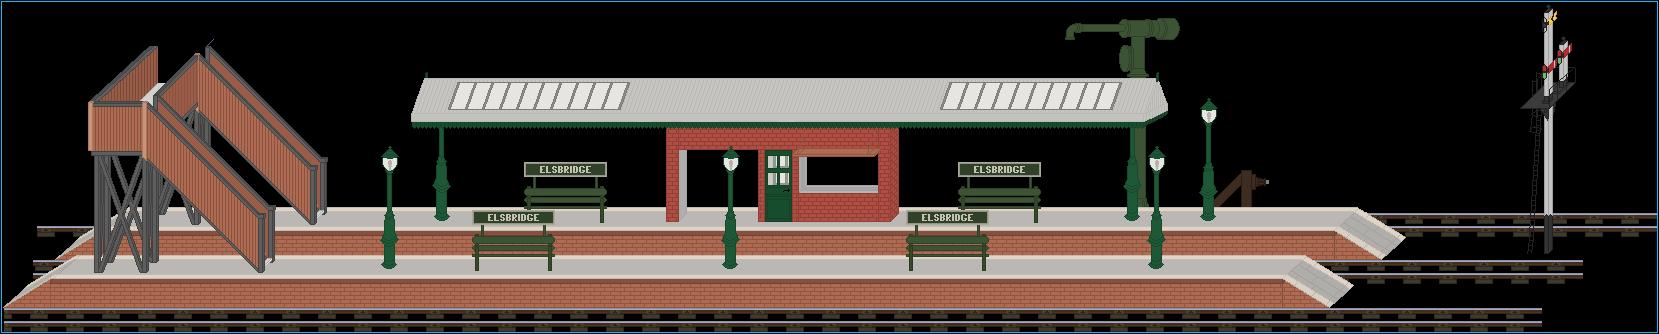 Elsbridge Station